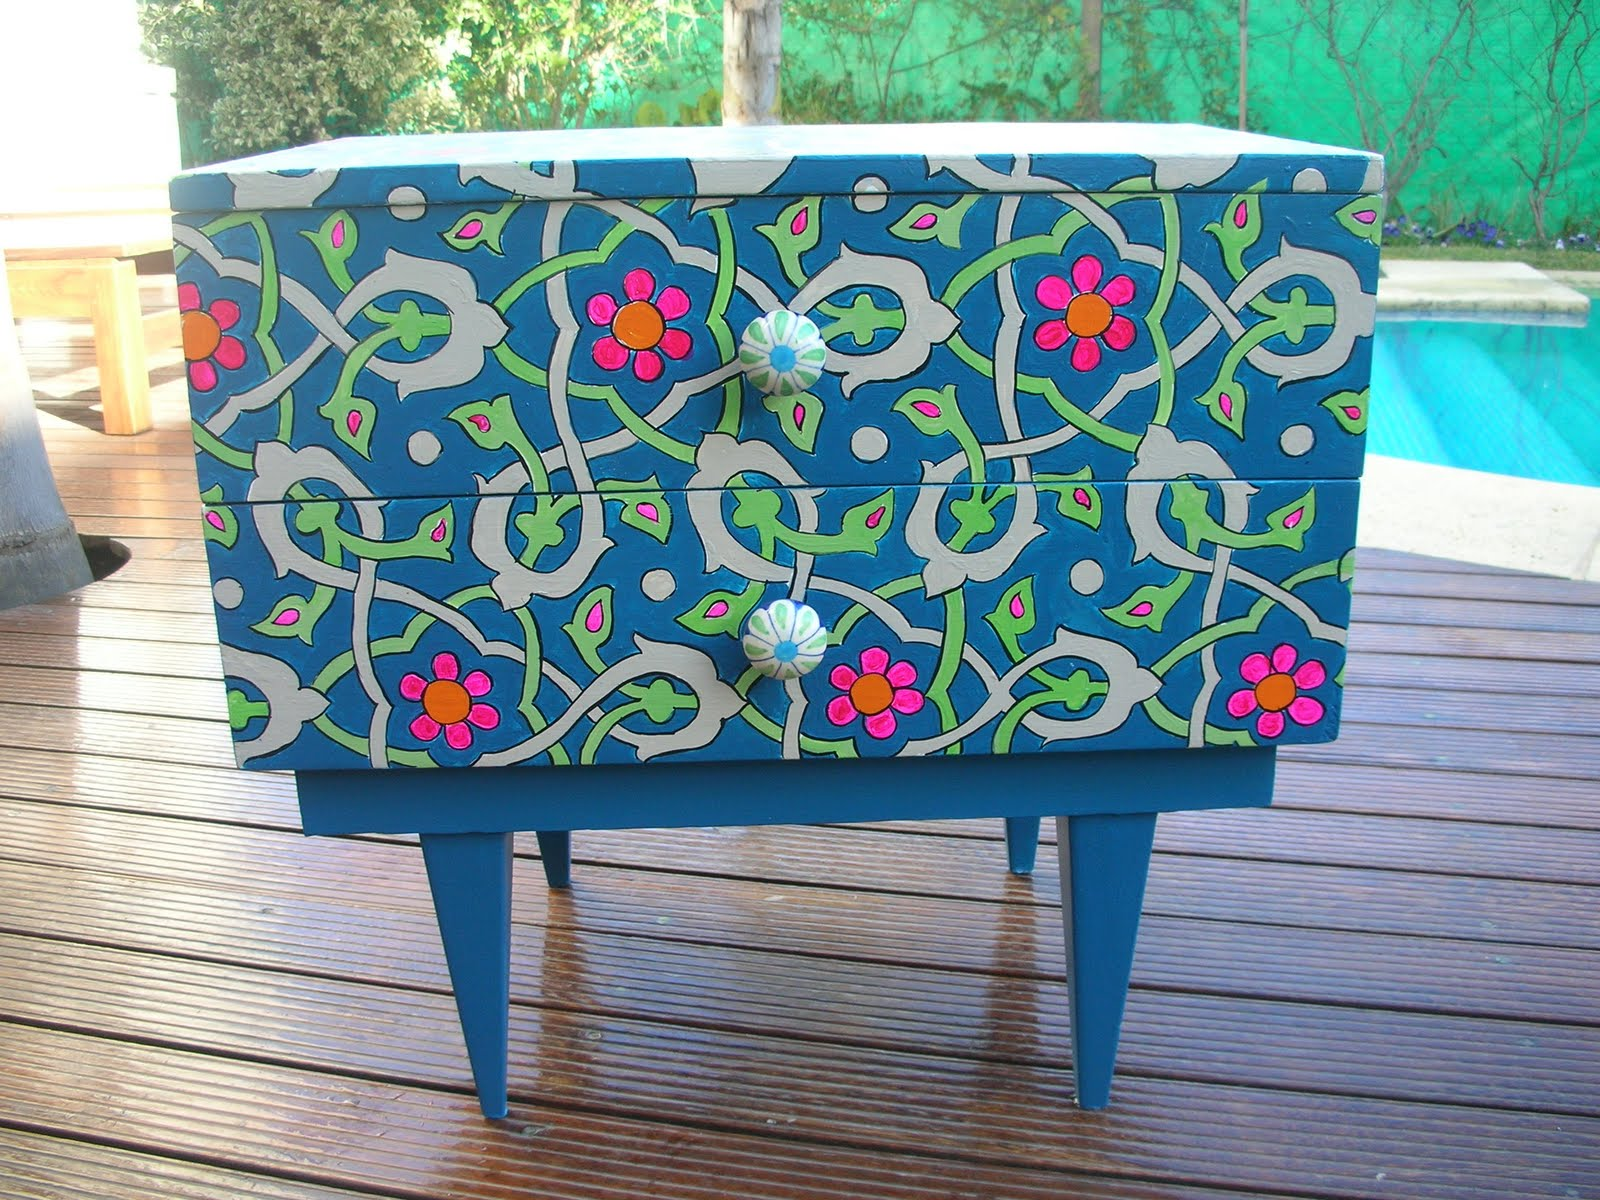 Vintouch muebles reciclados pintados a mano mesita - Disenos muebles pintados ...